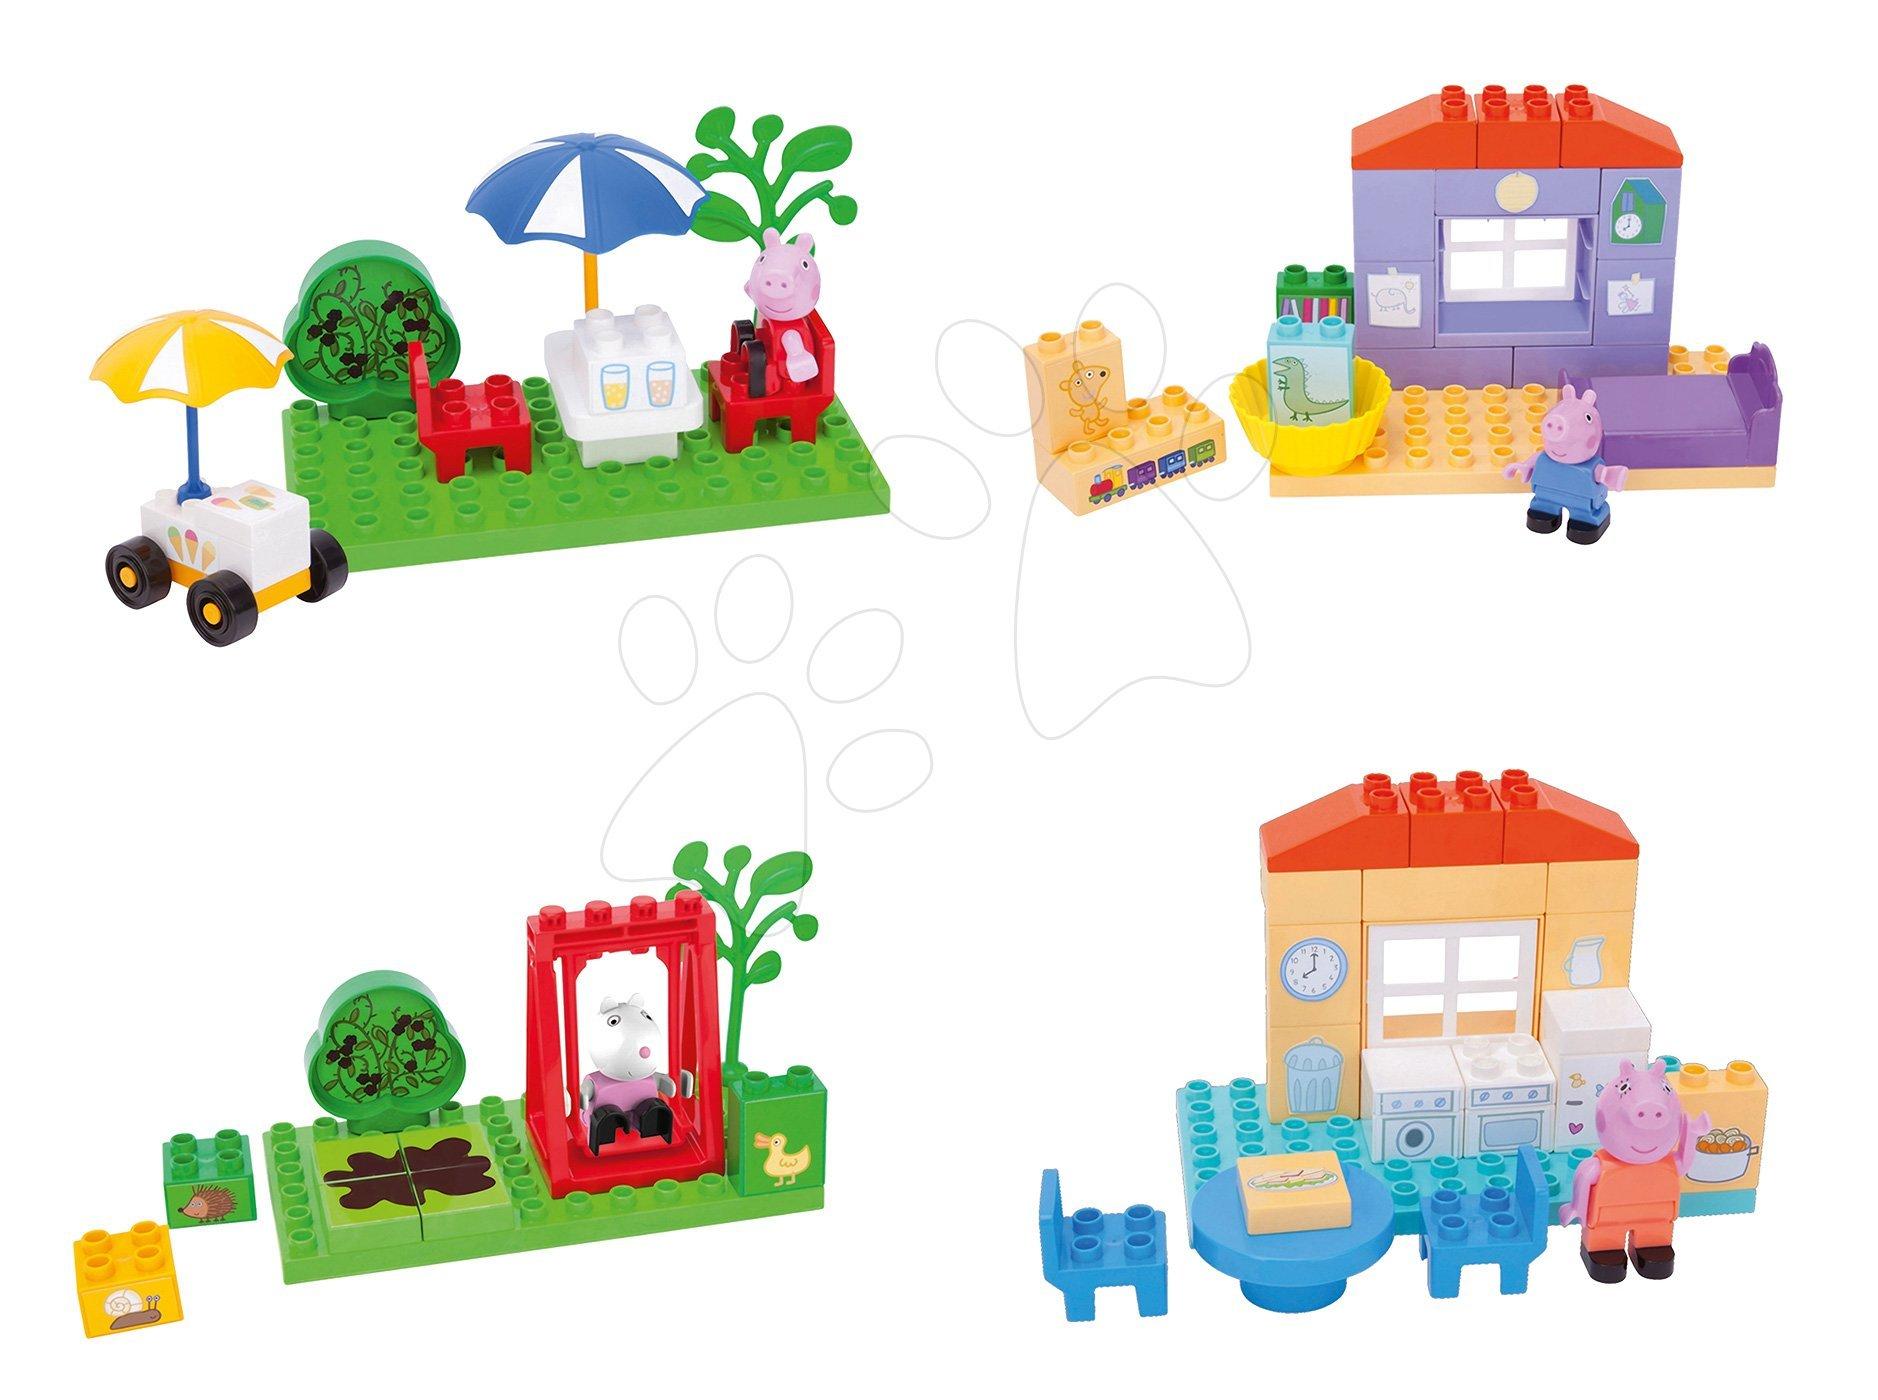 Set stavebnice Peppa Pig PlayBIG BLOXX 4 druhy s figurkami od 1,5-5 let